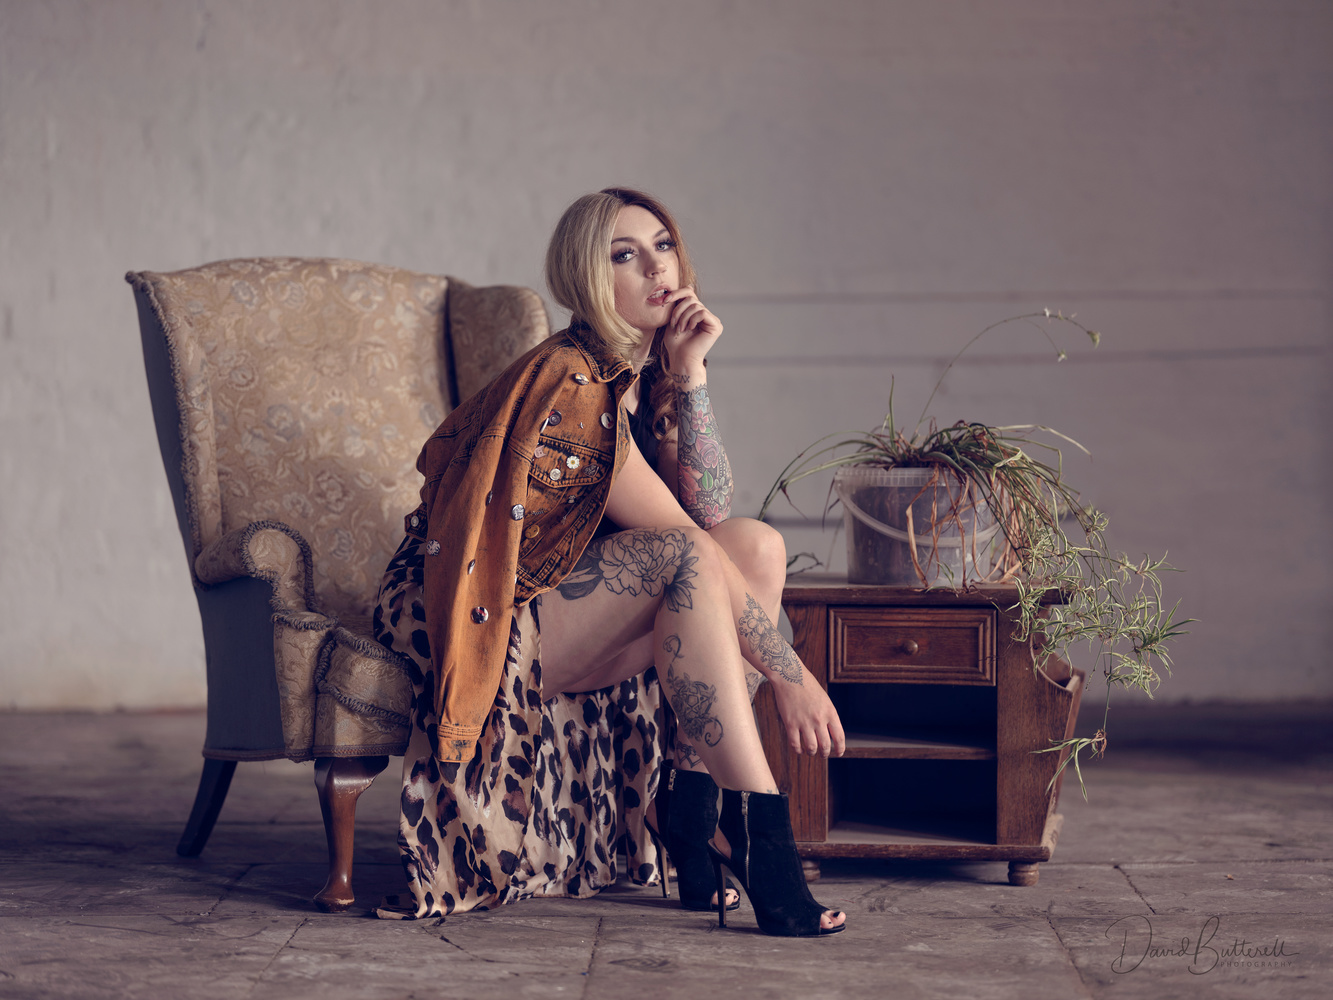 Hannah by David Butterell